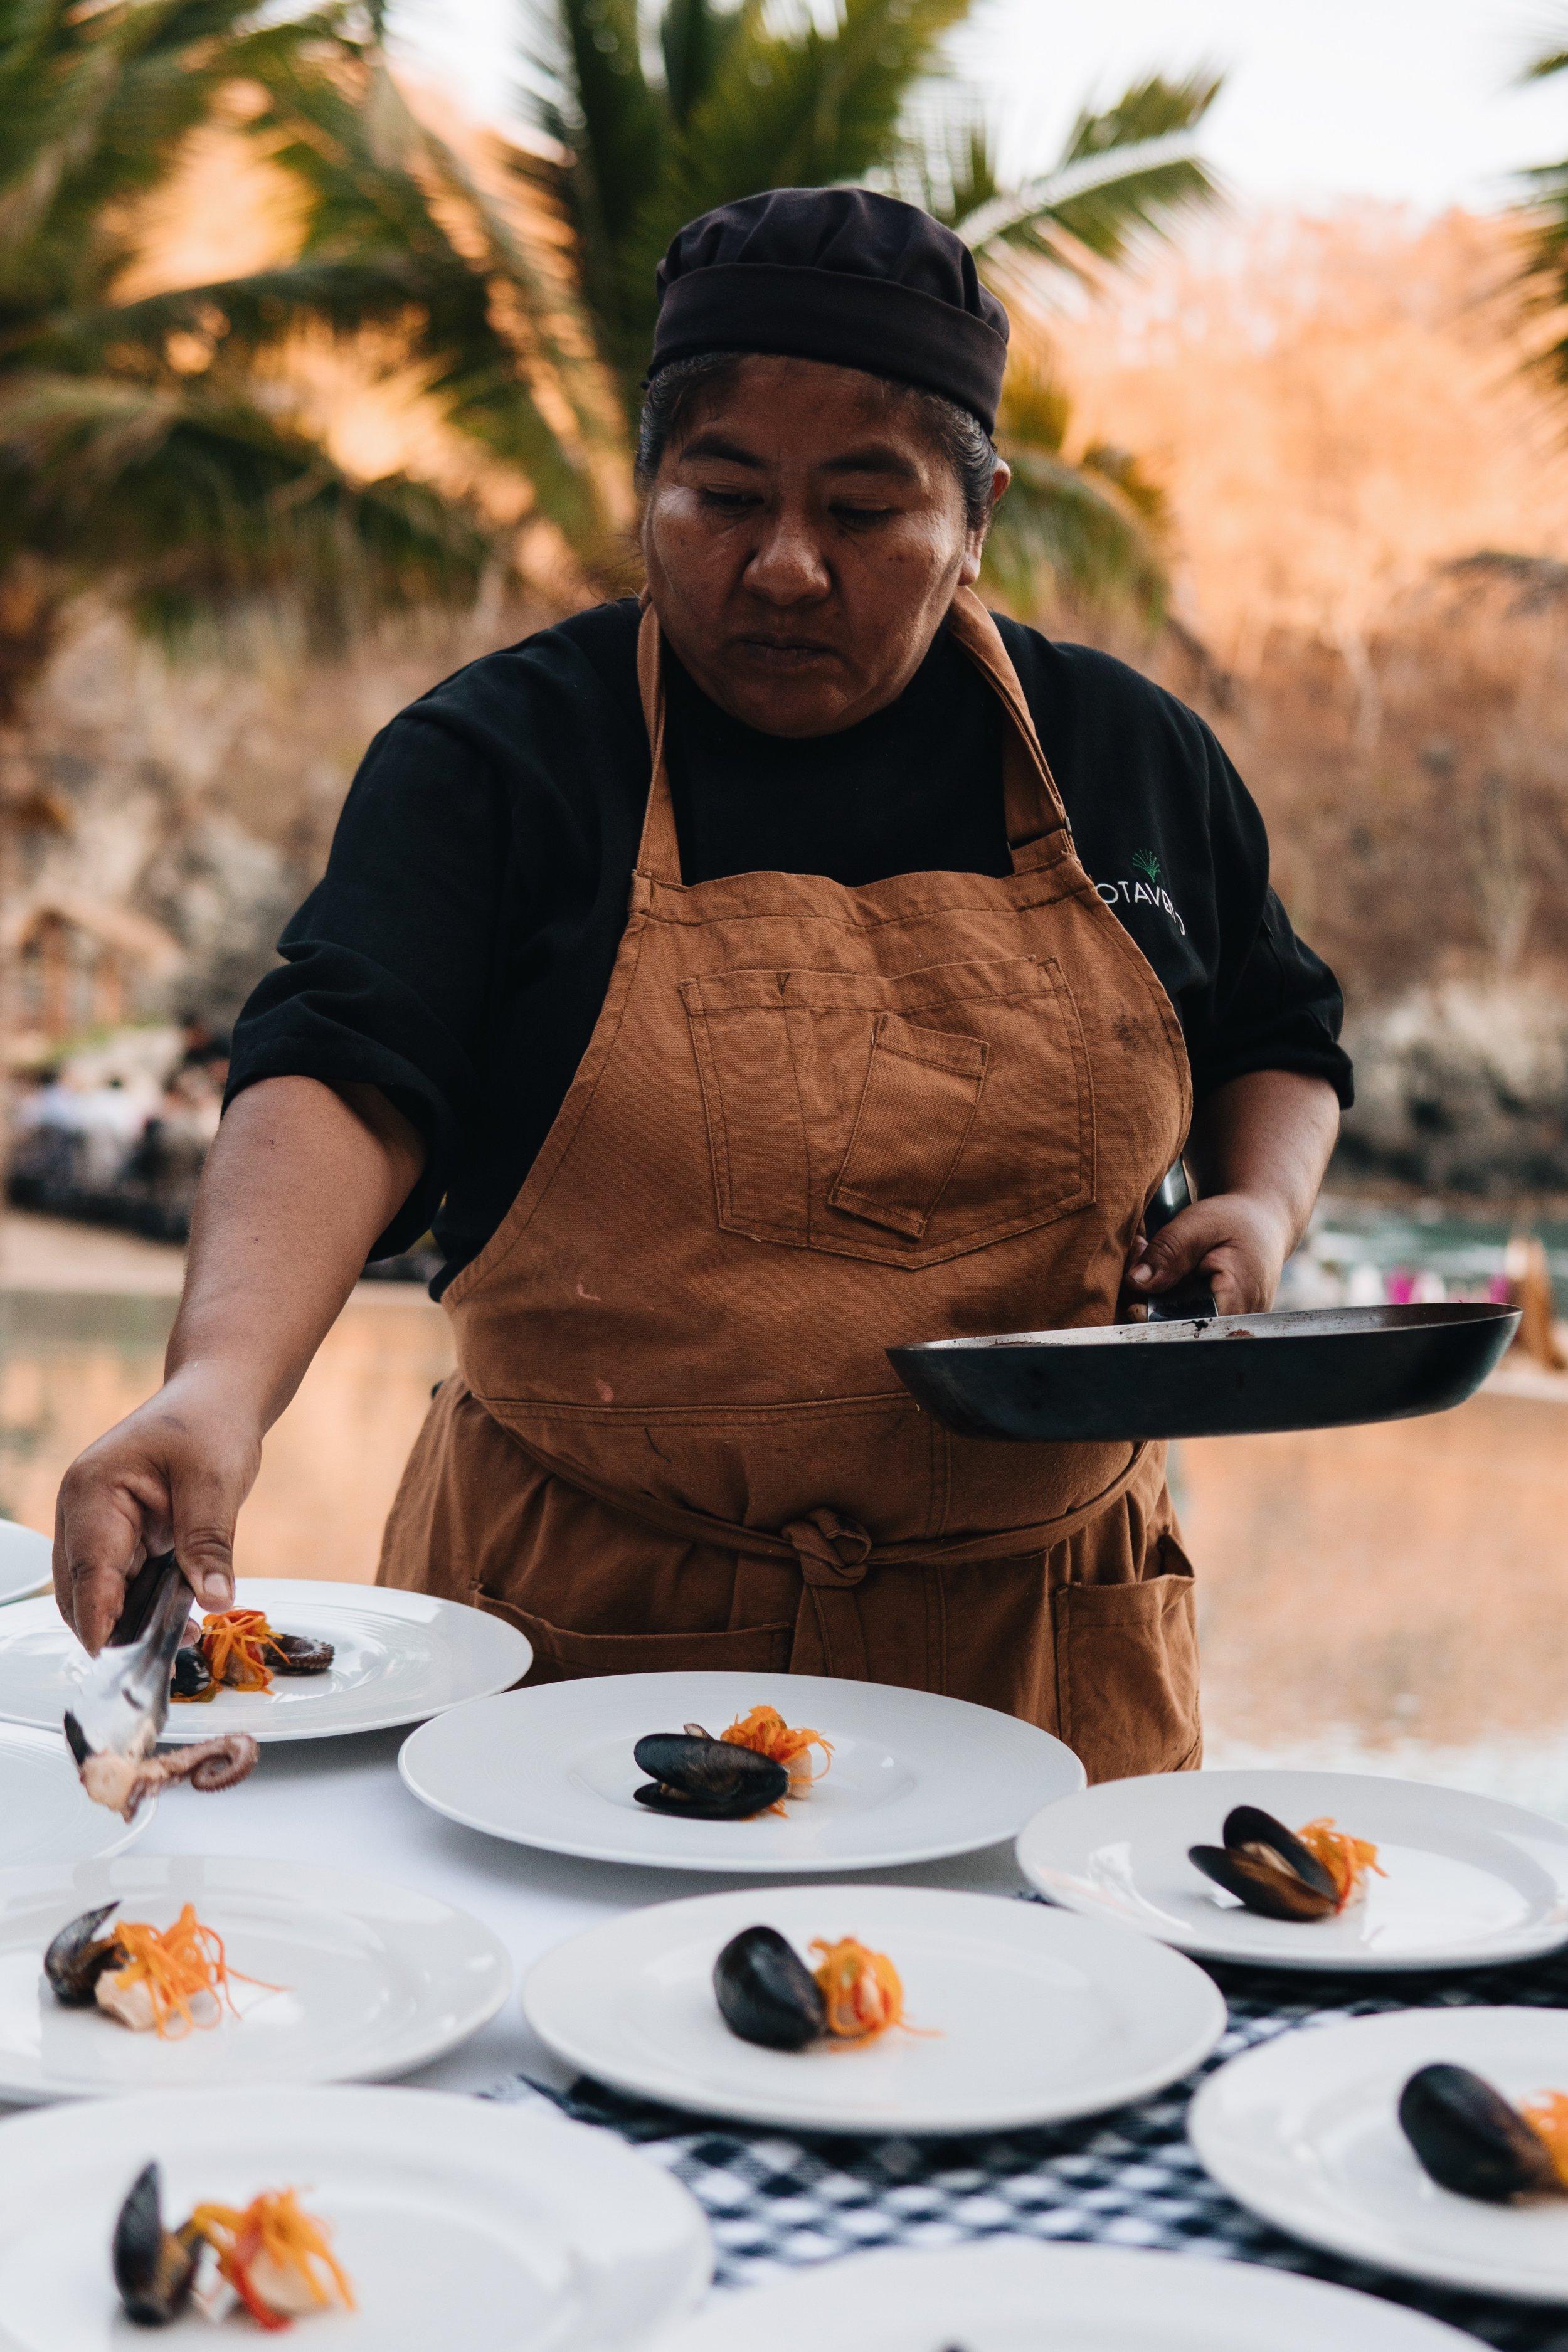 Clandestina-Punta-Garrobo-Ixtapa-Zihuatanejo-Angustina-Chef-Felipe-Meneses-Fotografía-Heiko-Bothe-14.JPG